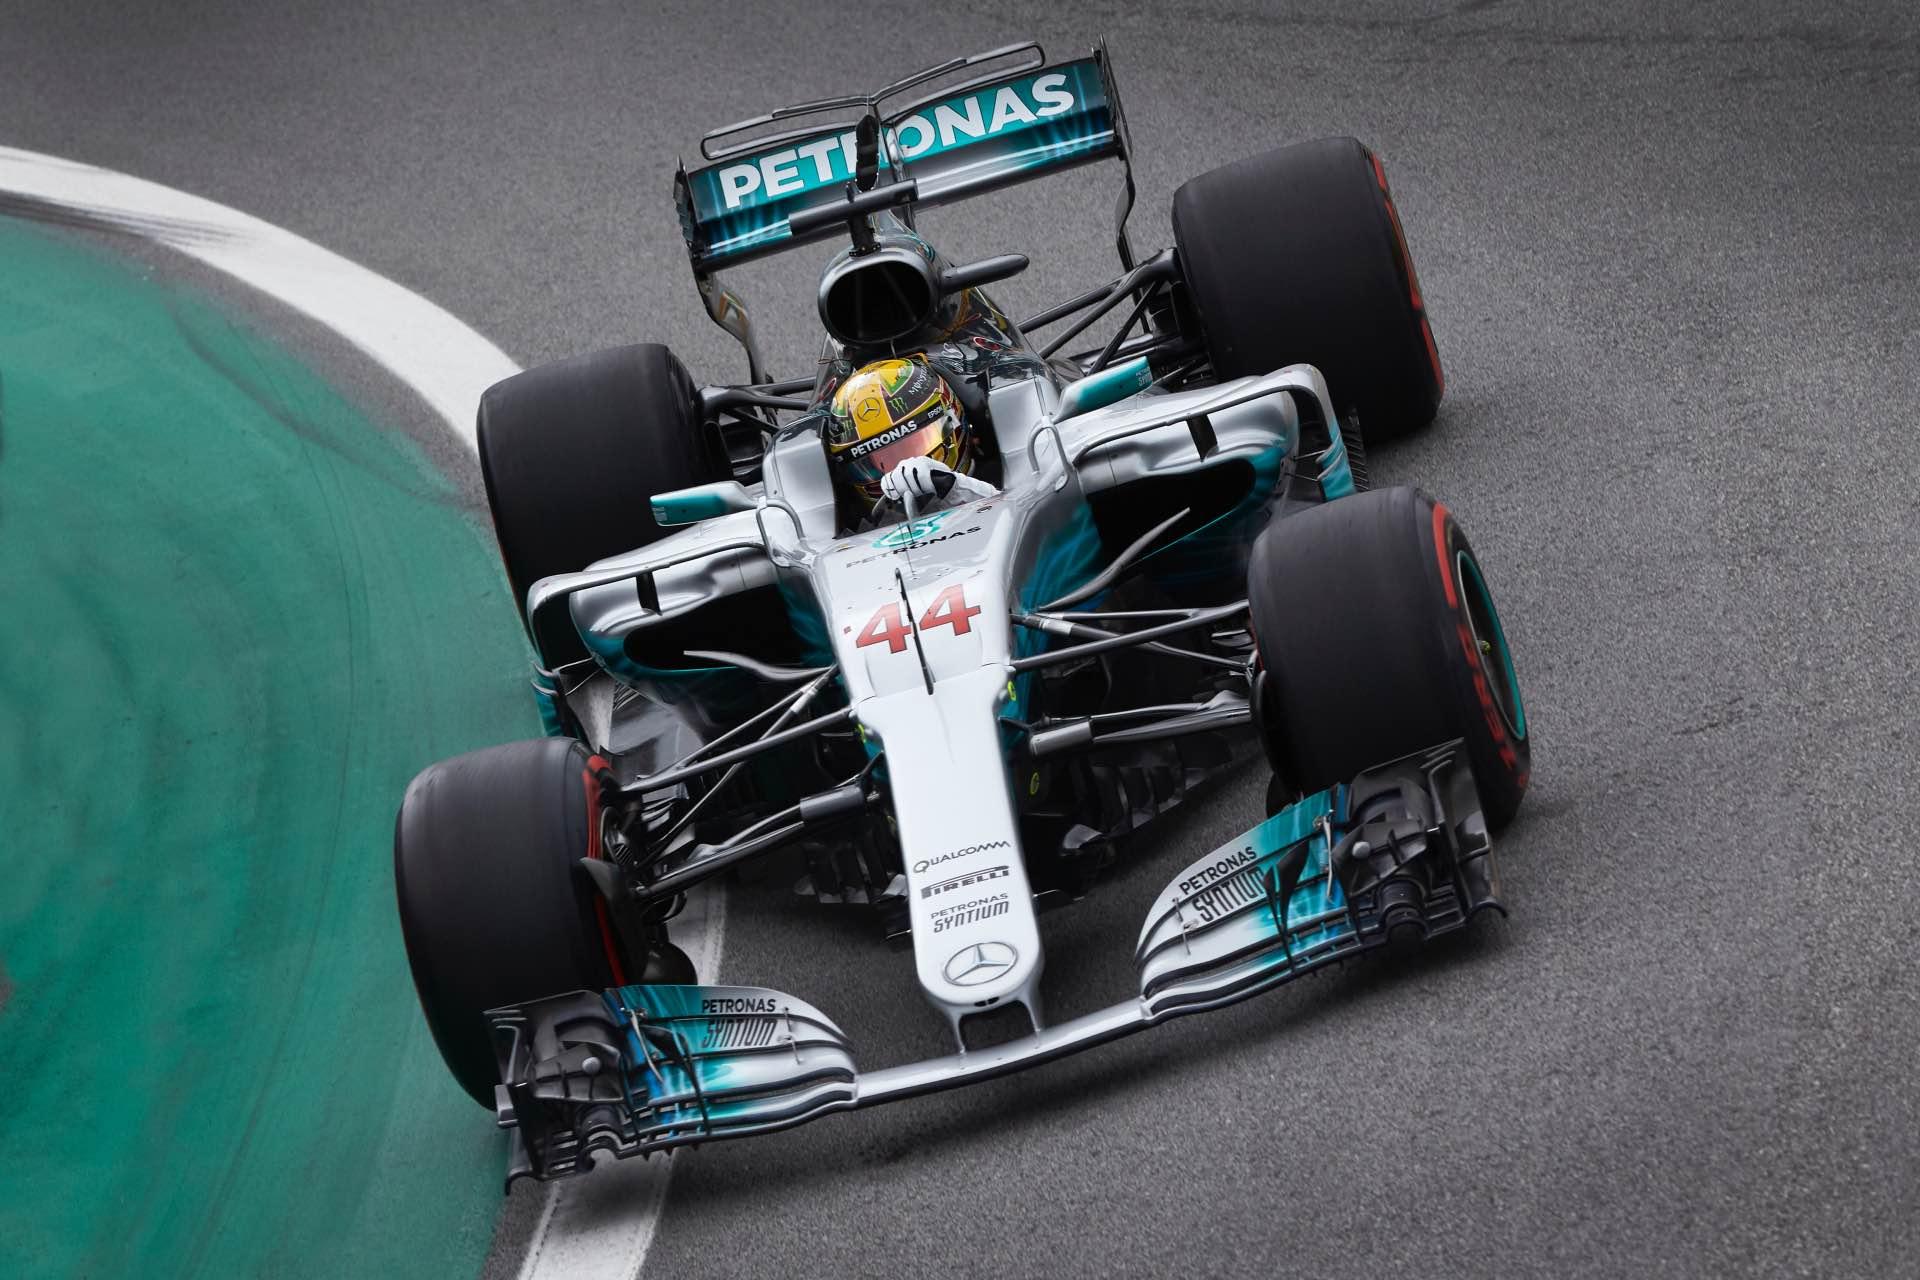 2017 Brazilian Grand Prix, Saturday – Steve Etherington